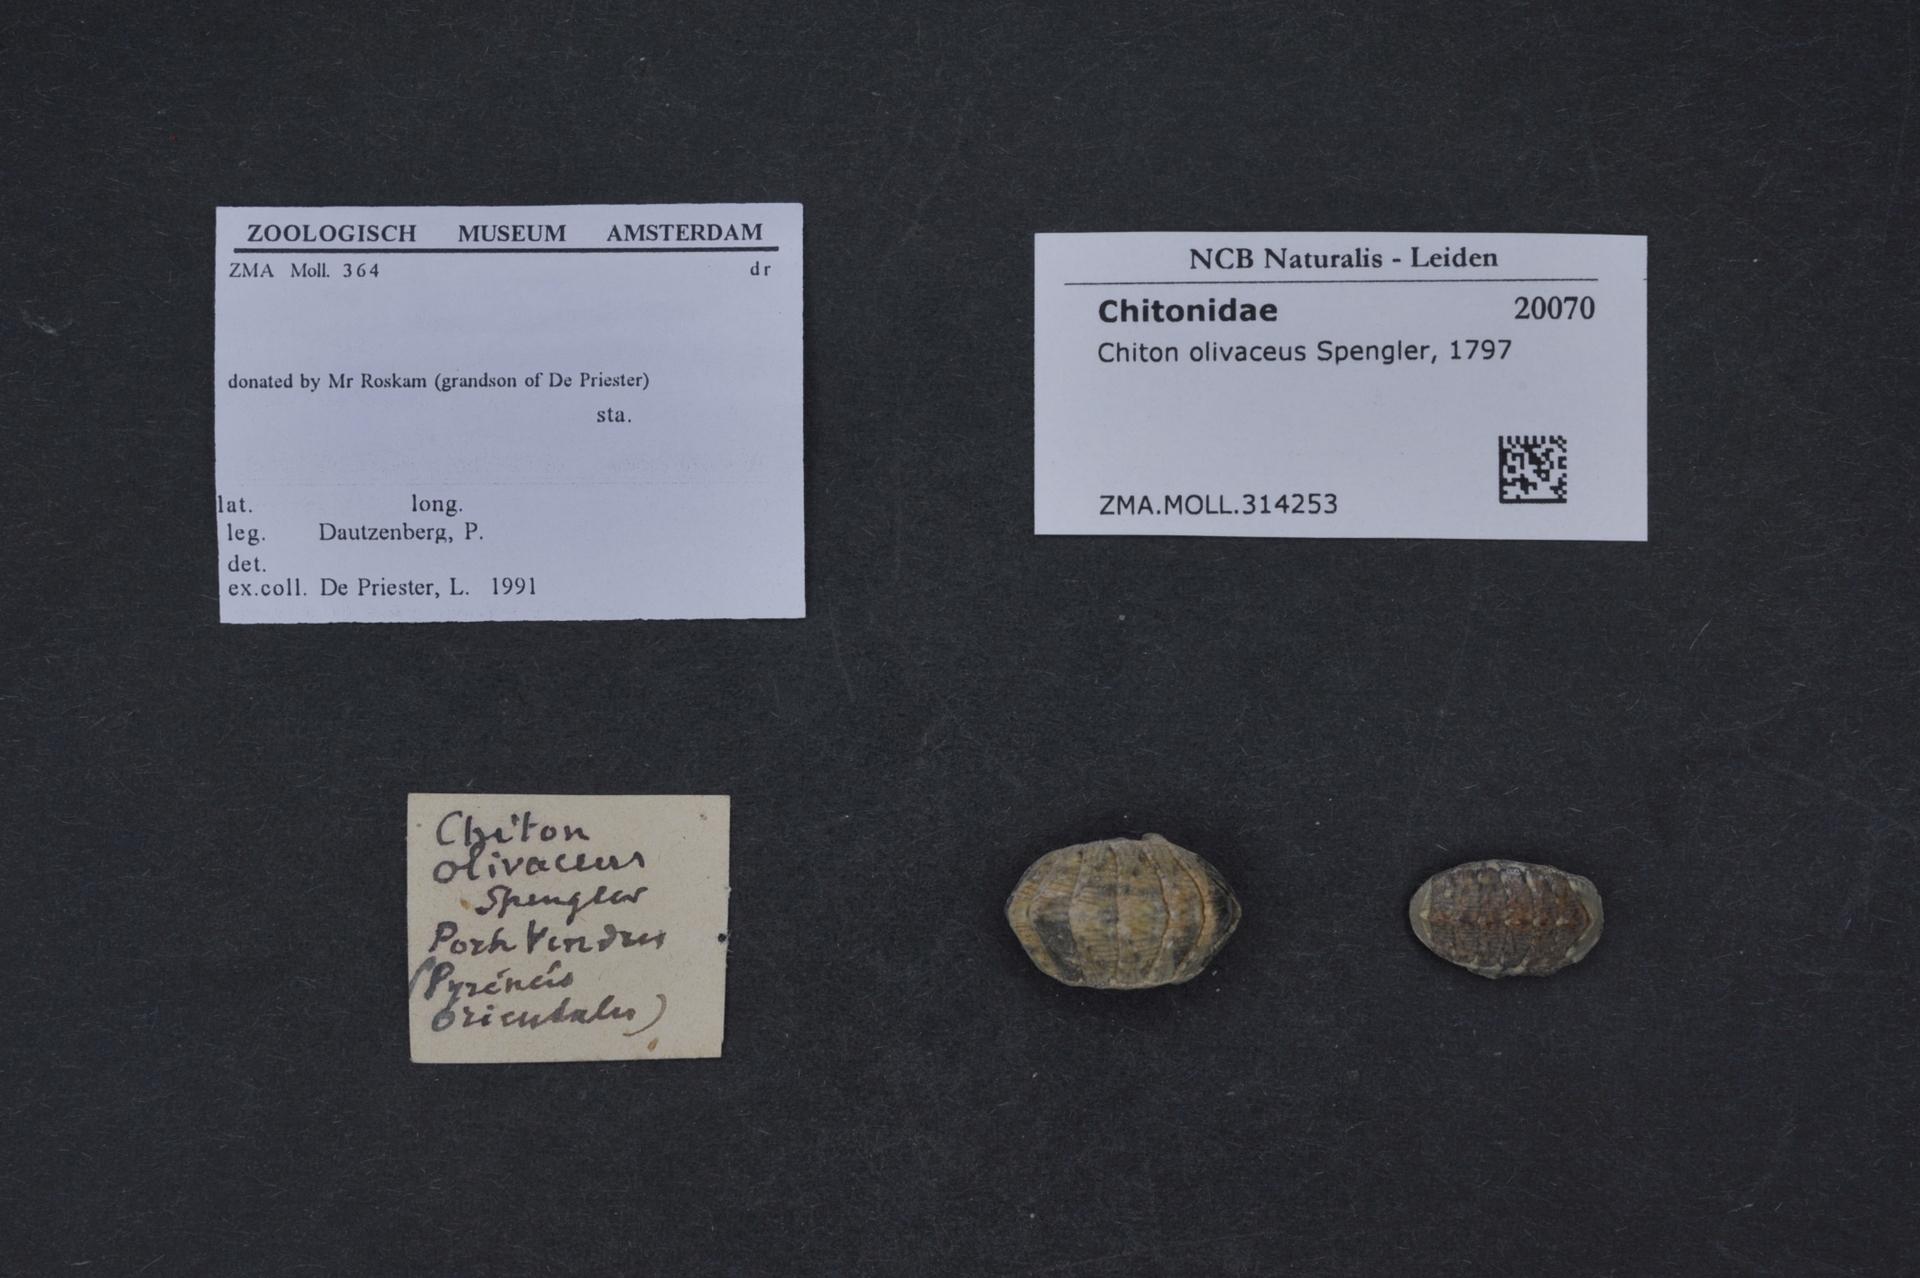 ZMA.MOLL.314253 | Chiton olivaceus Spengler, 1797